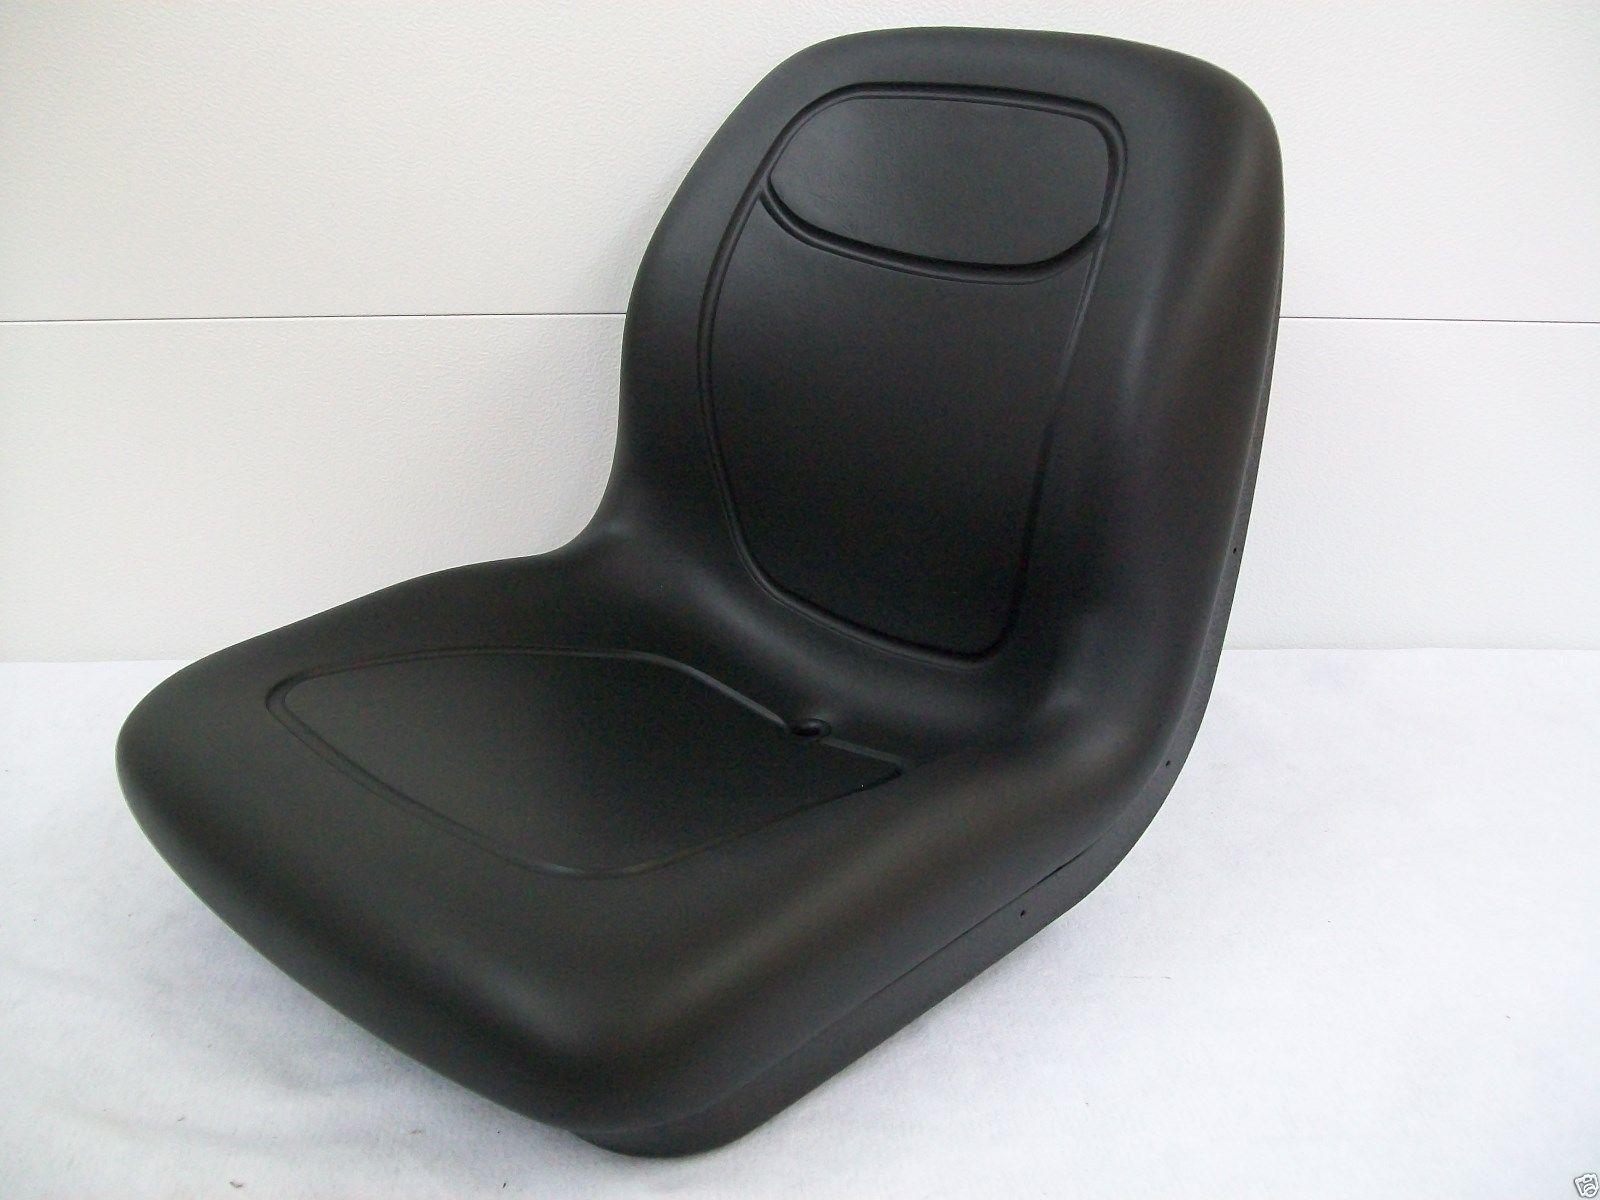 black seat fit kubota l2800 l3400 l4400 mx4700 mx5100 mx5000 black seat fit kubota l2800l3400l4400mx4700mx5100mx5000 compact tractor gg